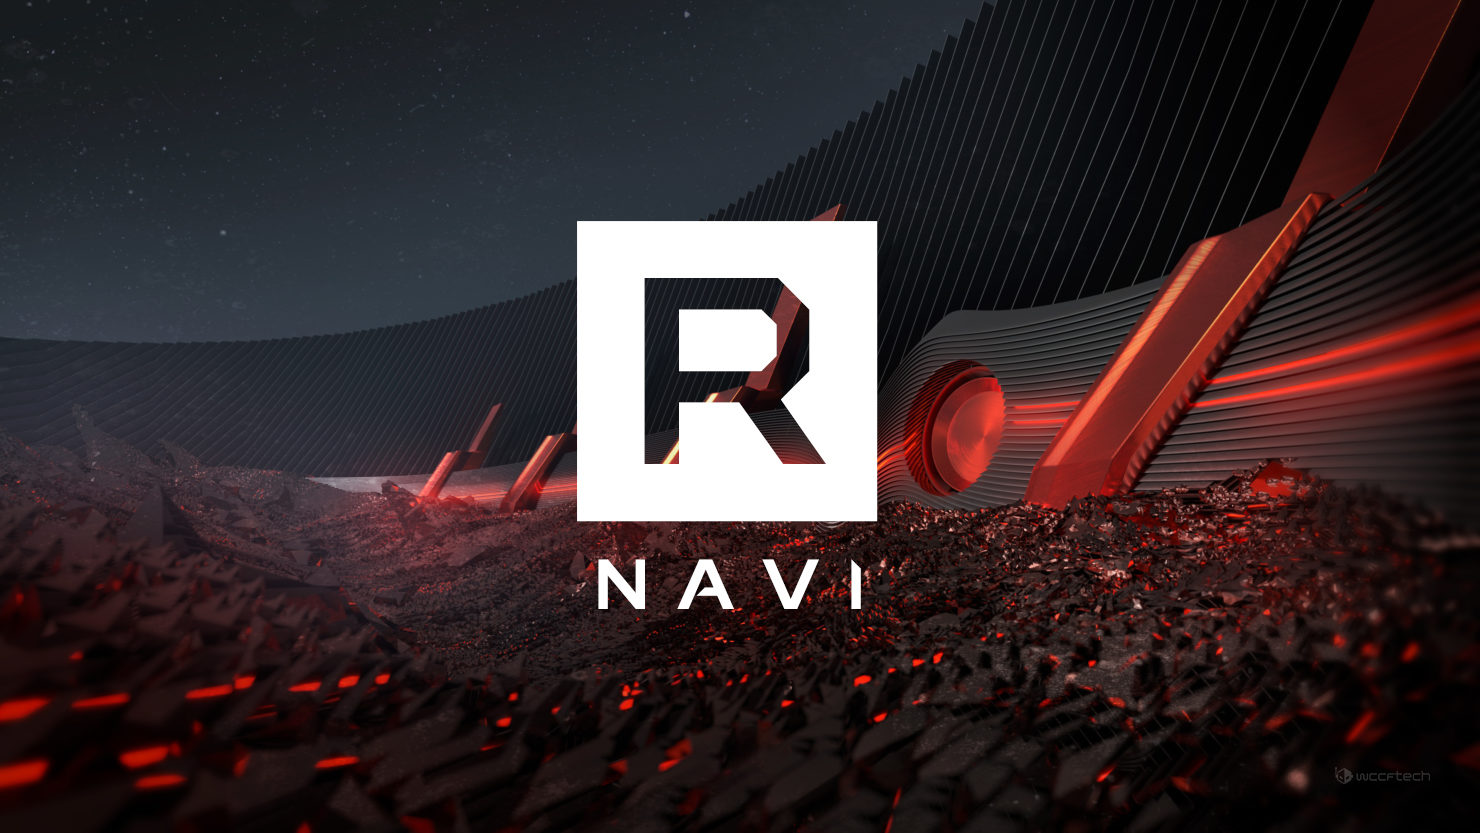 A featured image of the upcoming AMD 'Big' Navi GPU.